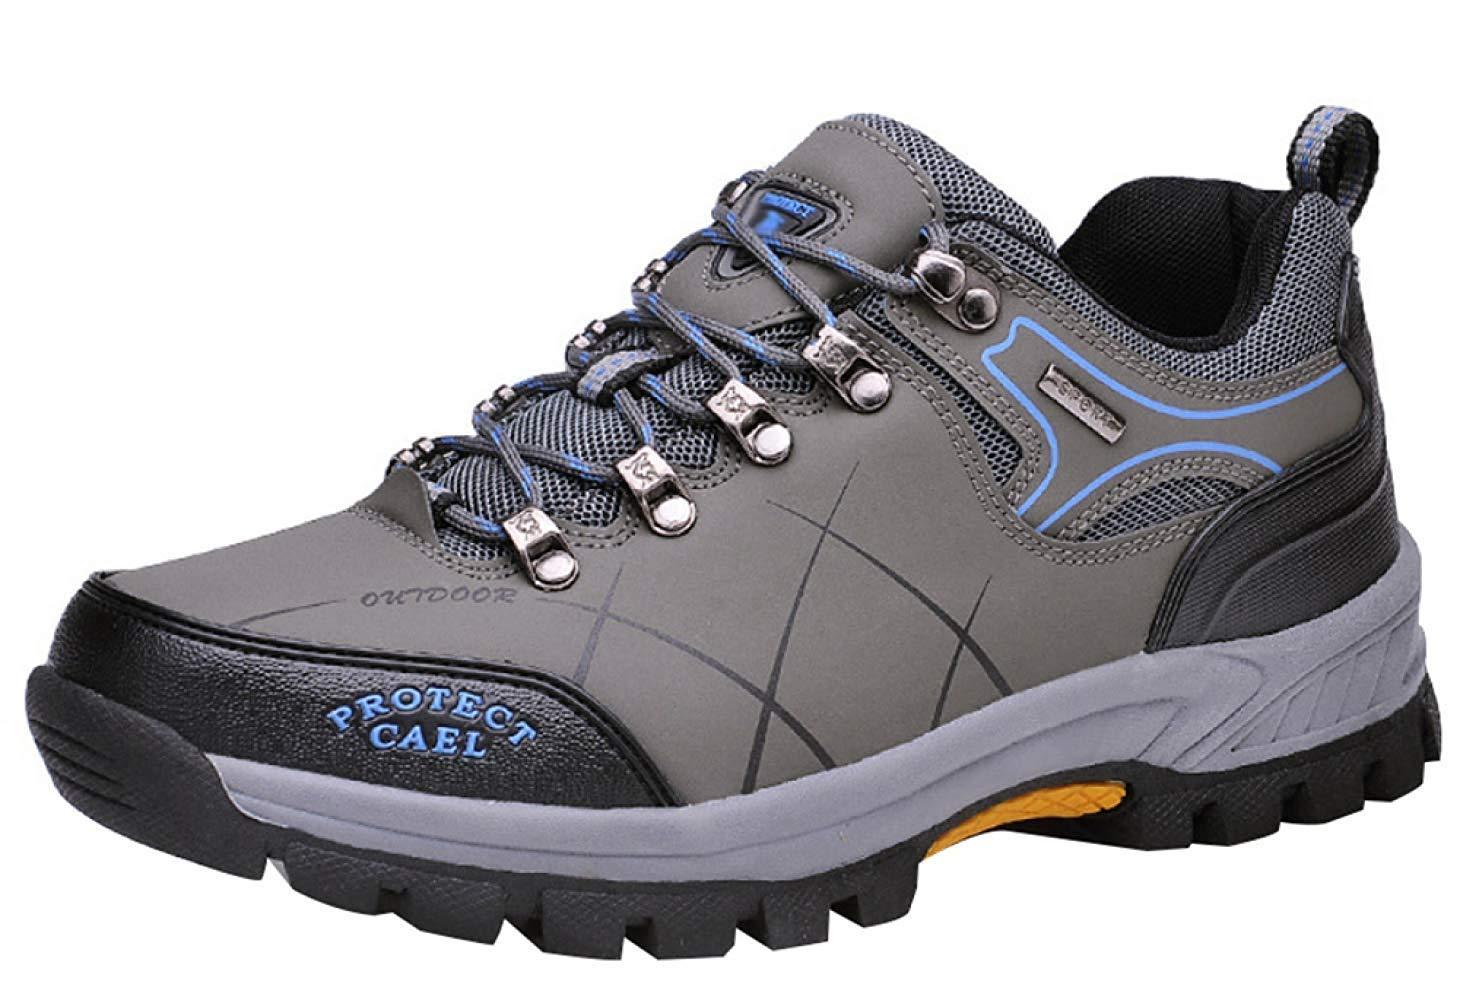 HhGold Männer Wanderschuhe Stiefel Leder Wanderschuhe Turnschuhe Für Outdoor Trekking Training Beiläufige Arbeit (Farbe : 8, Größe : 41EU)